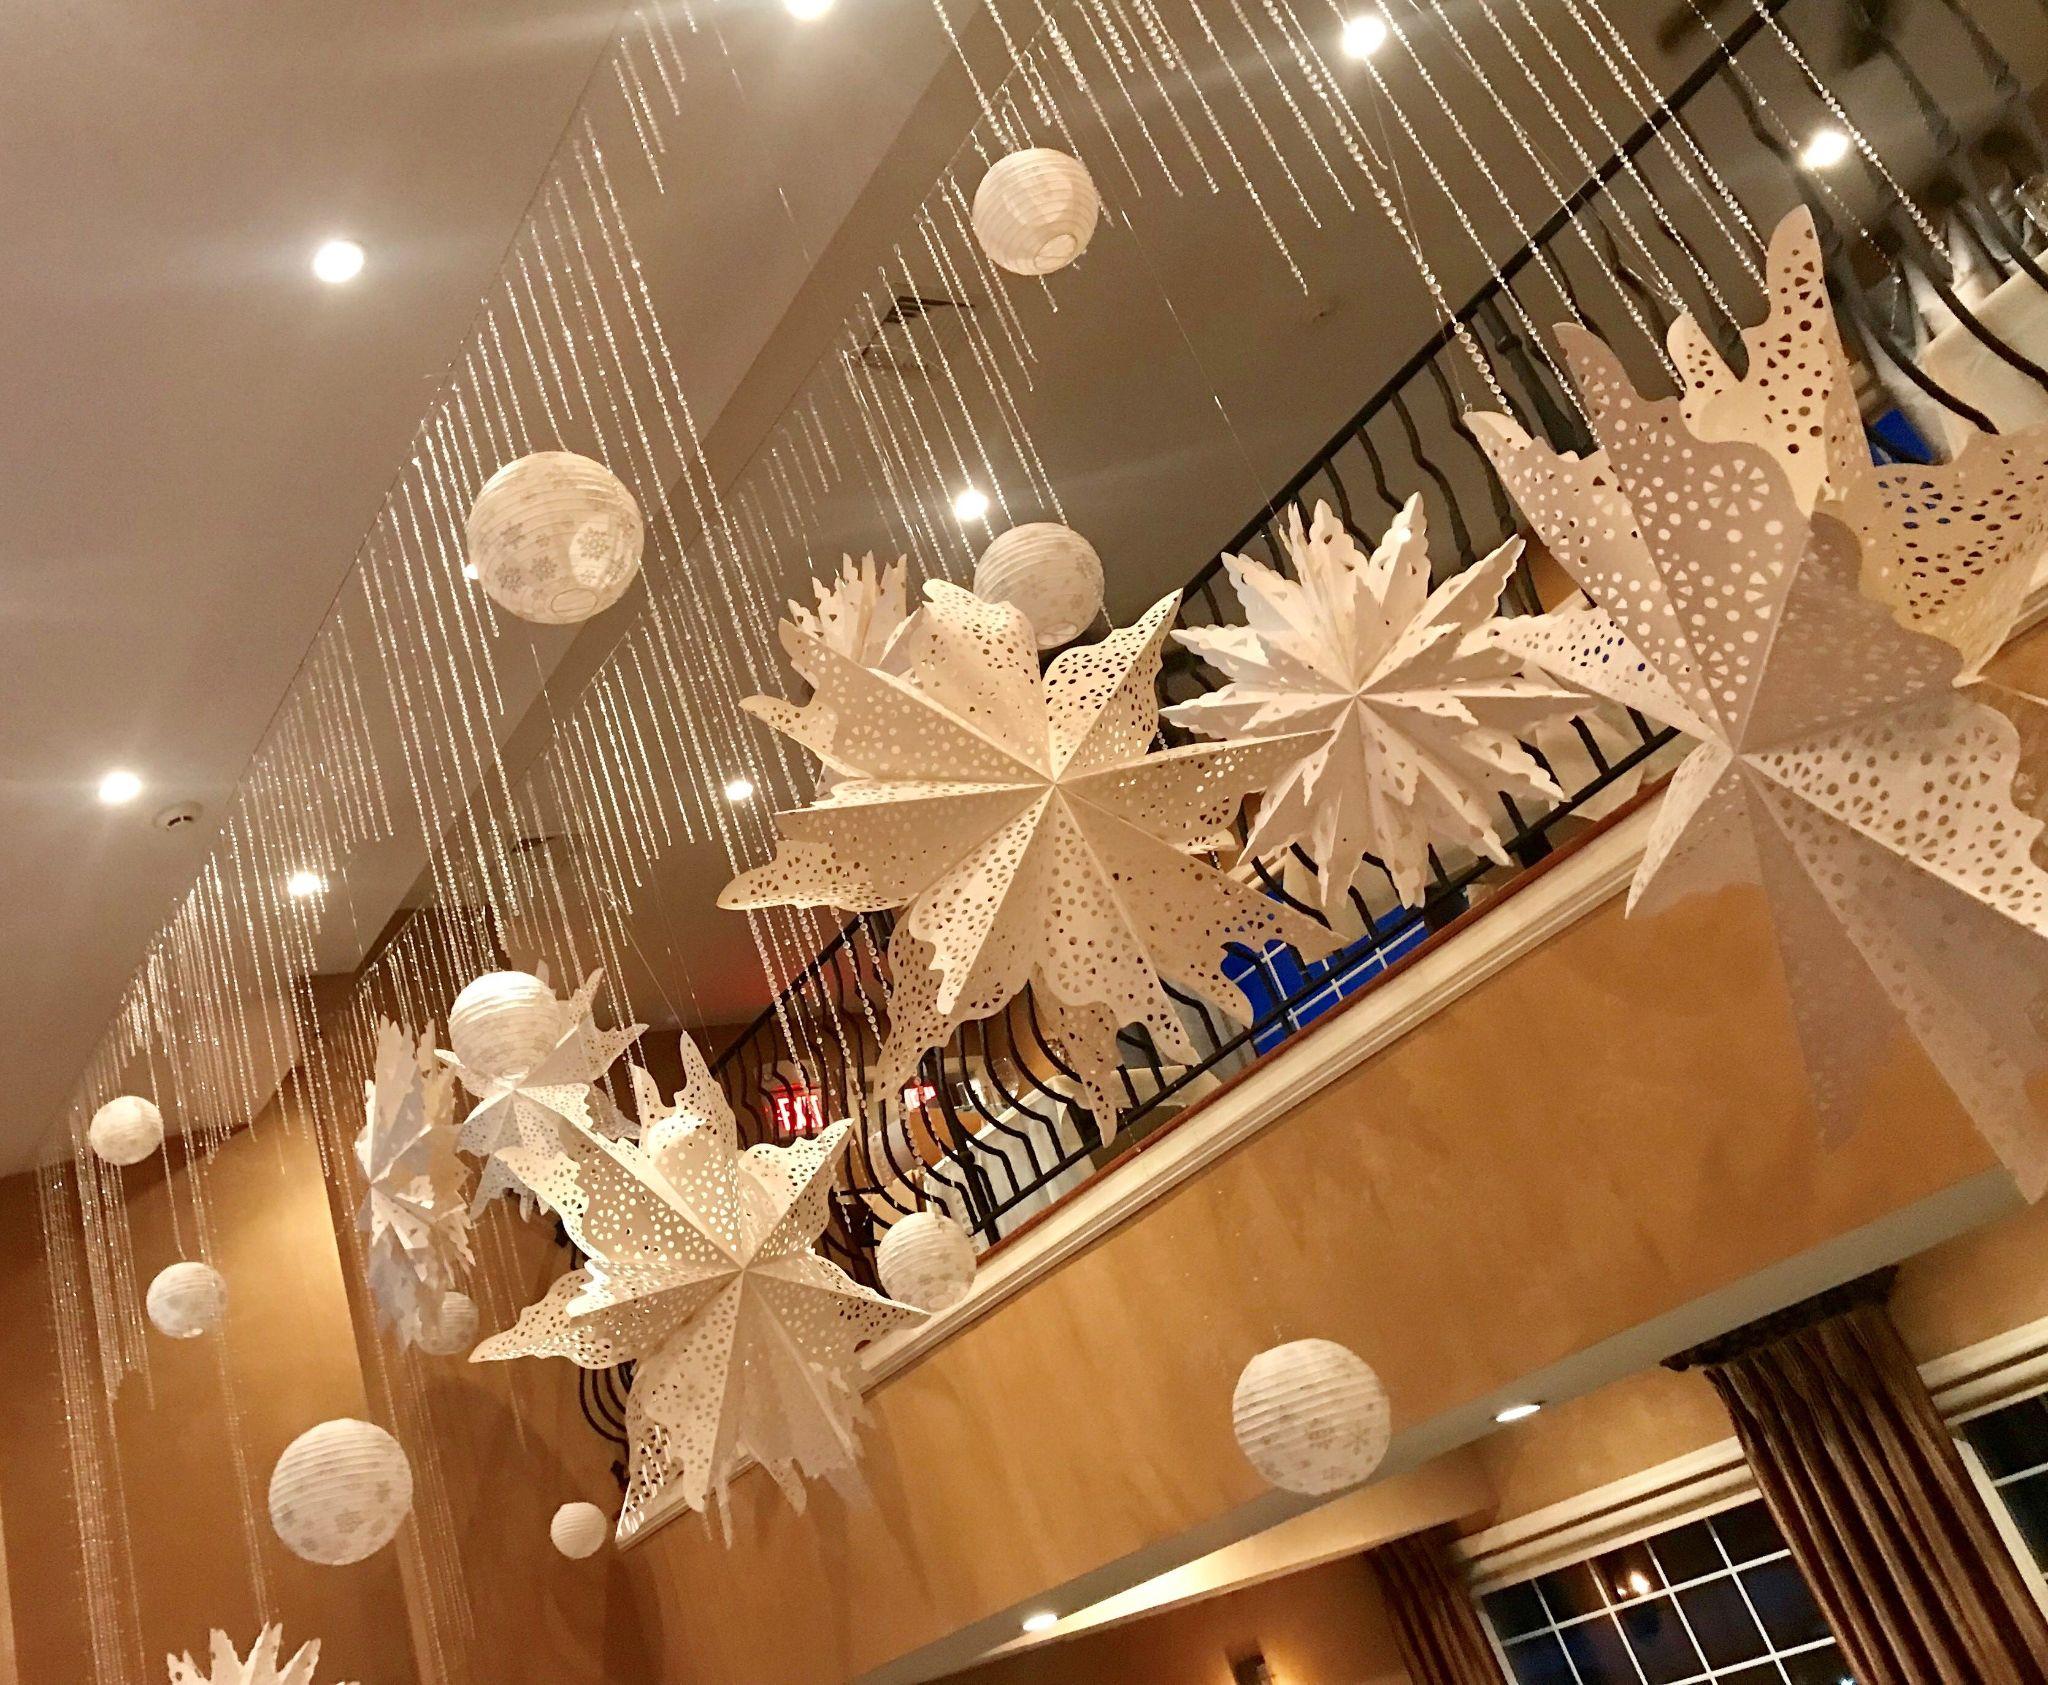 Xmas Ceiling Decoration Ideas